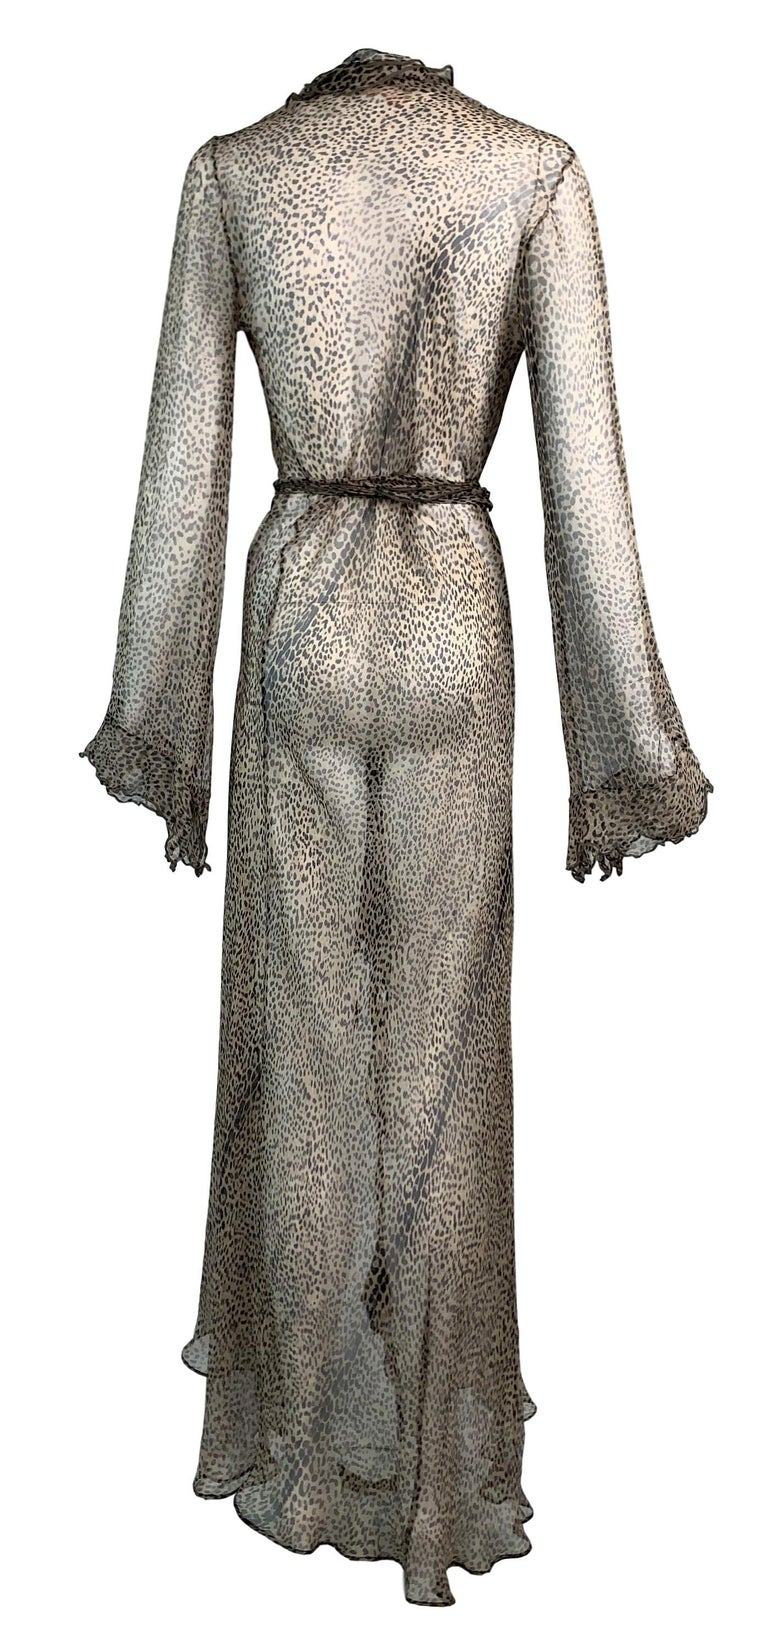 Gray S/S 2002 Roberto Cavalli Runway Sheer Leopard Silk Wrap Maxi Dress For Sale